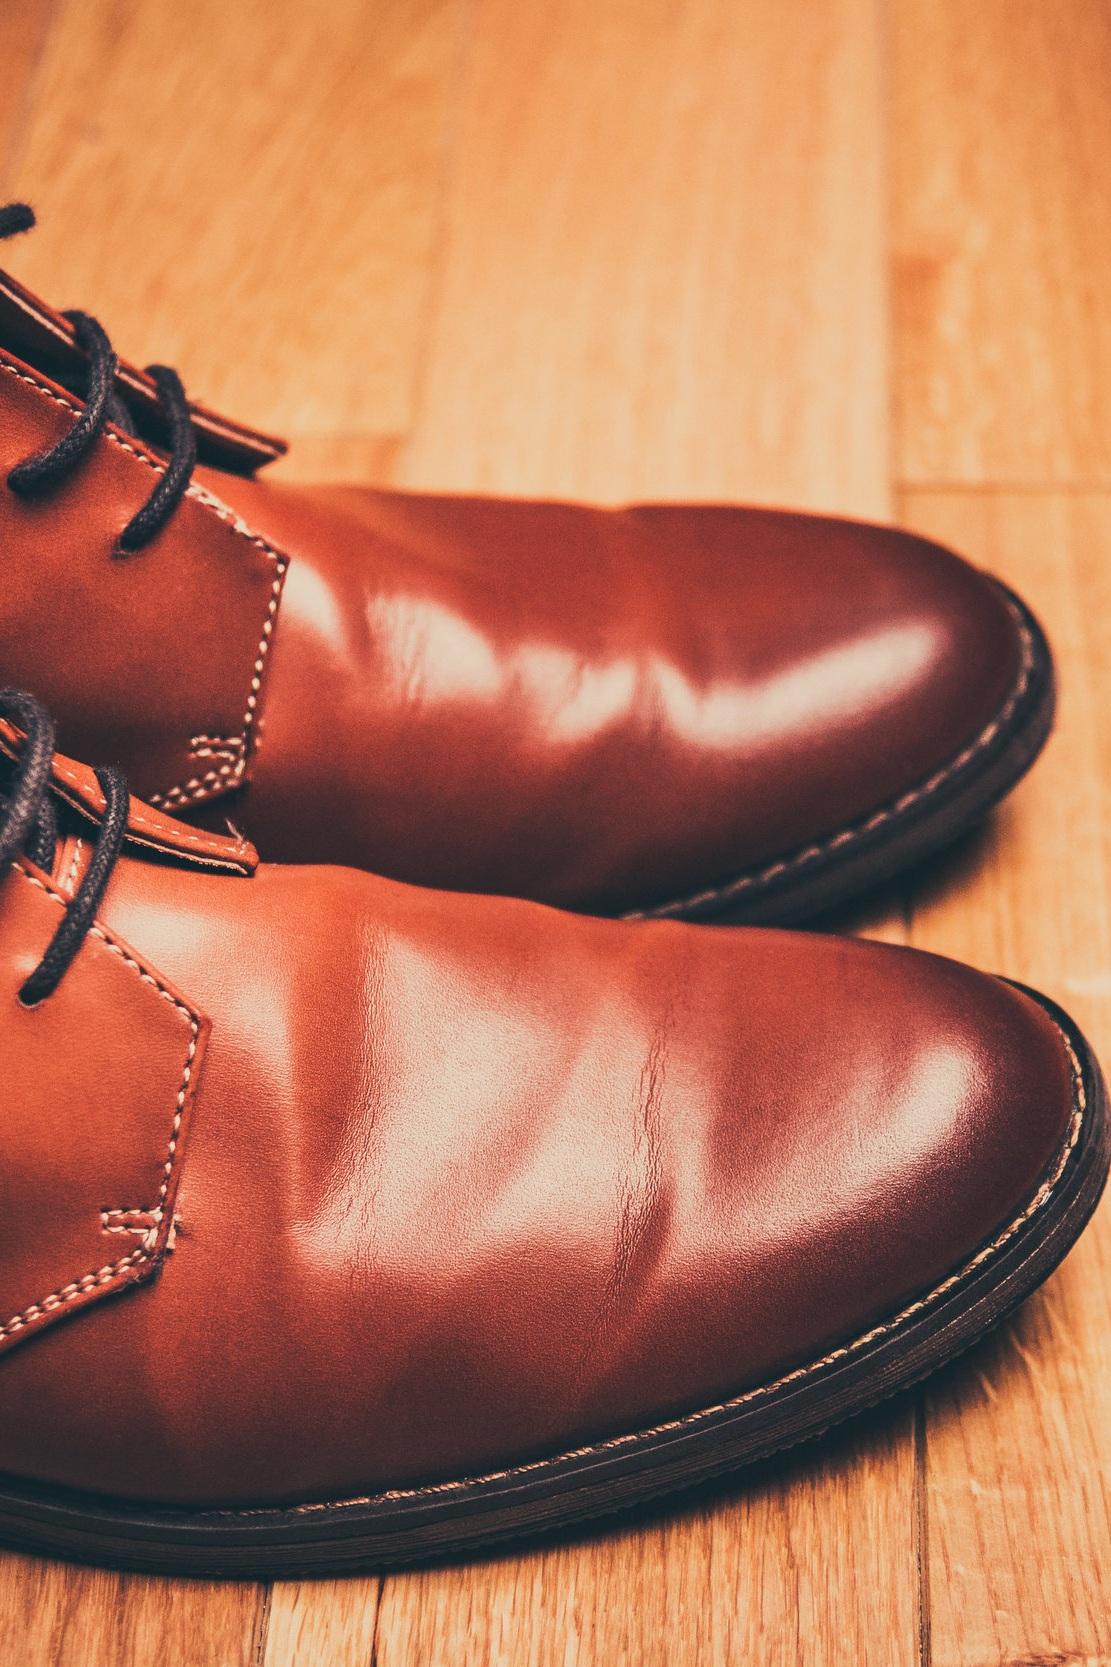 Swing+dance+shoes+on+a+hardwood+dance+floor